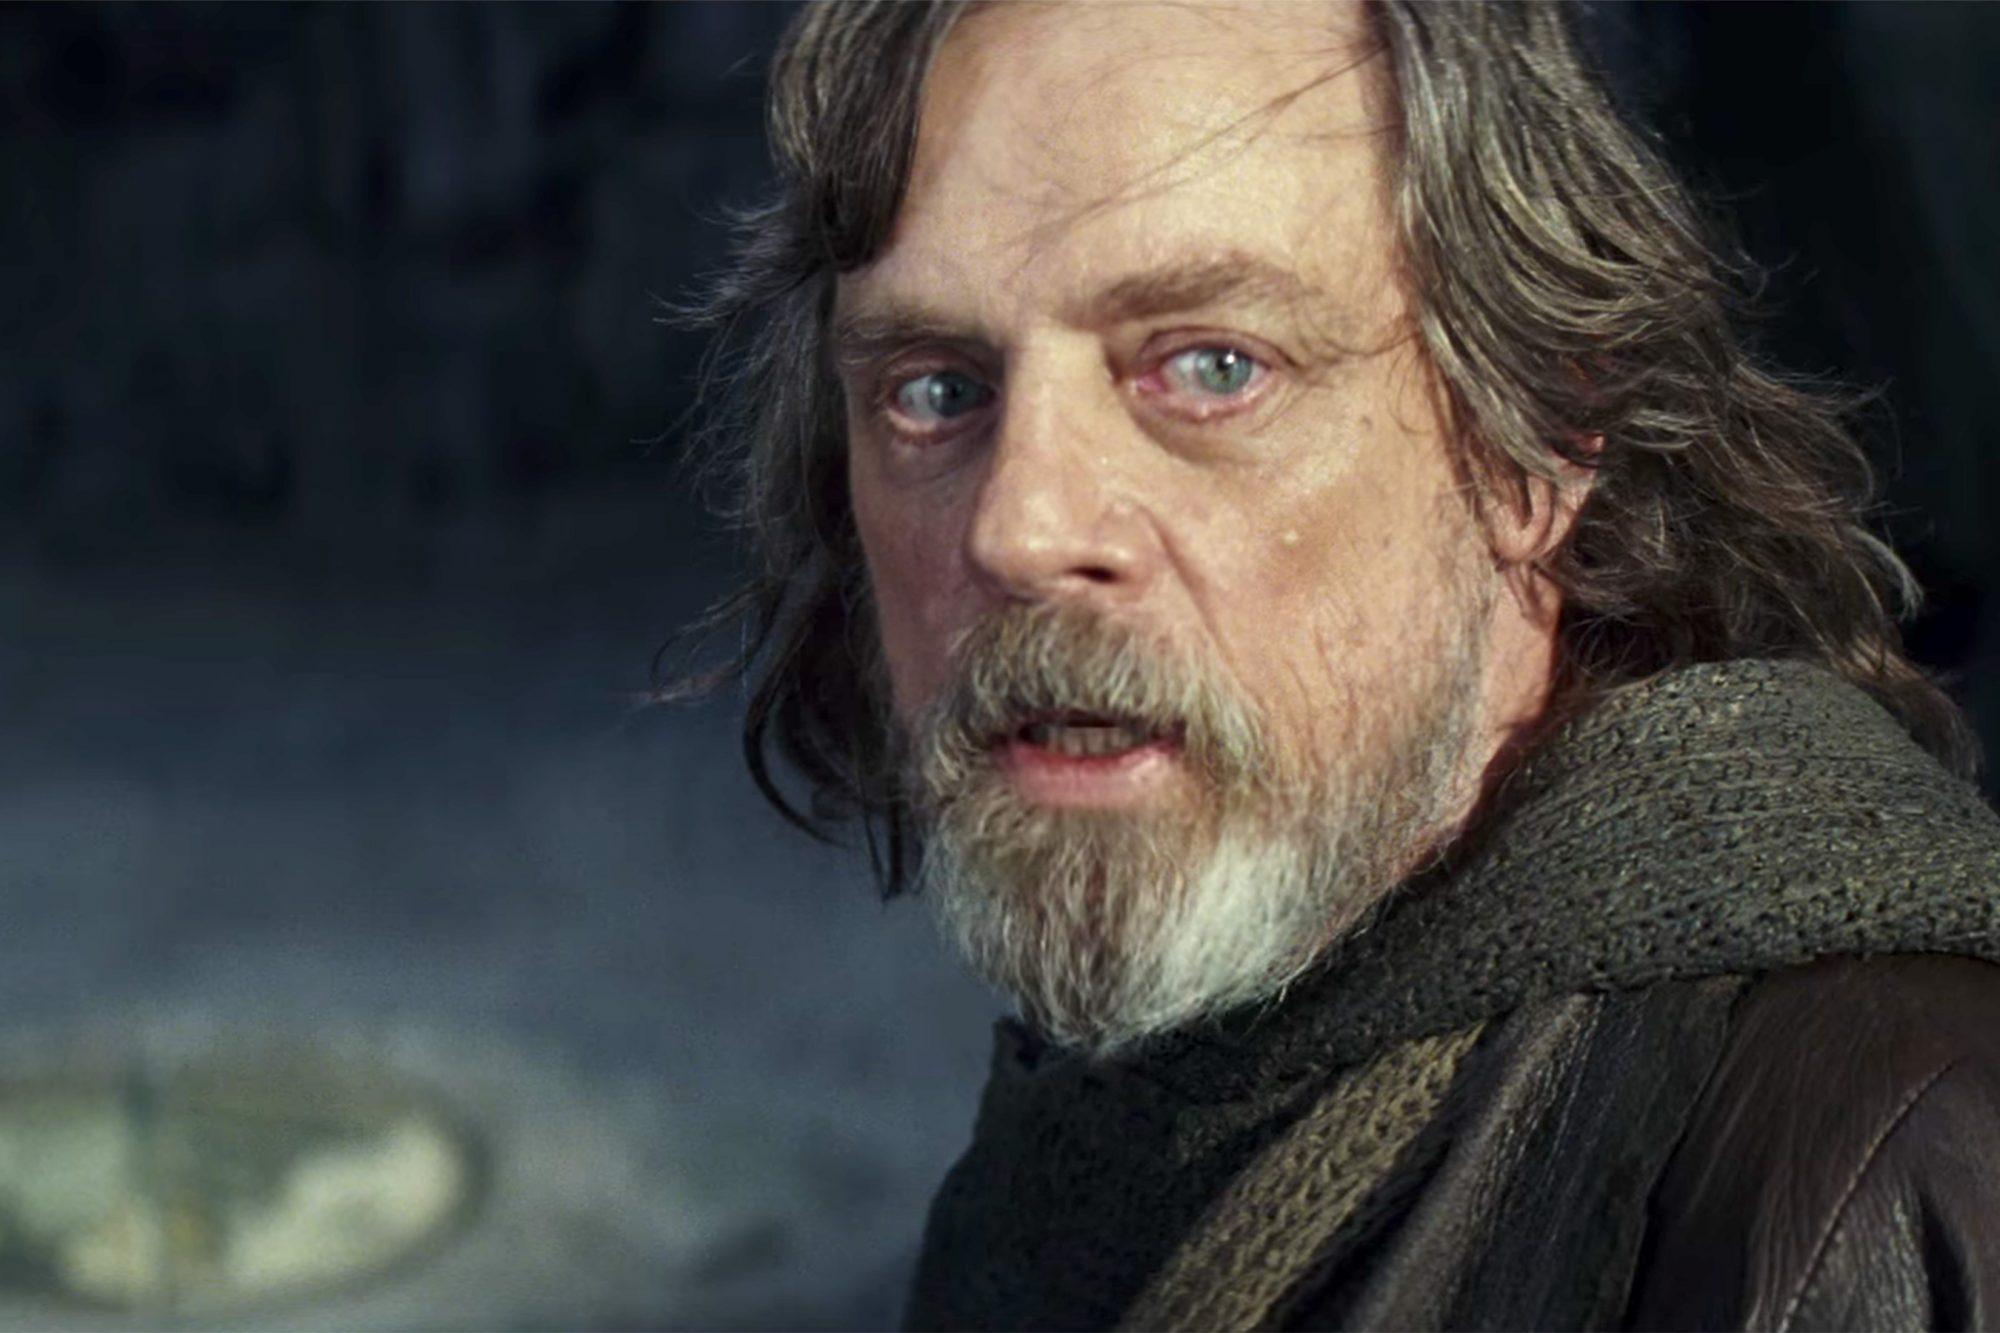 The Last Jedi Joseph Gordon Levitt Role Revealed And More Star Wars Easter Eggs Ew Com